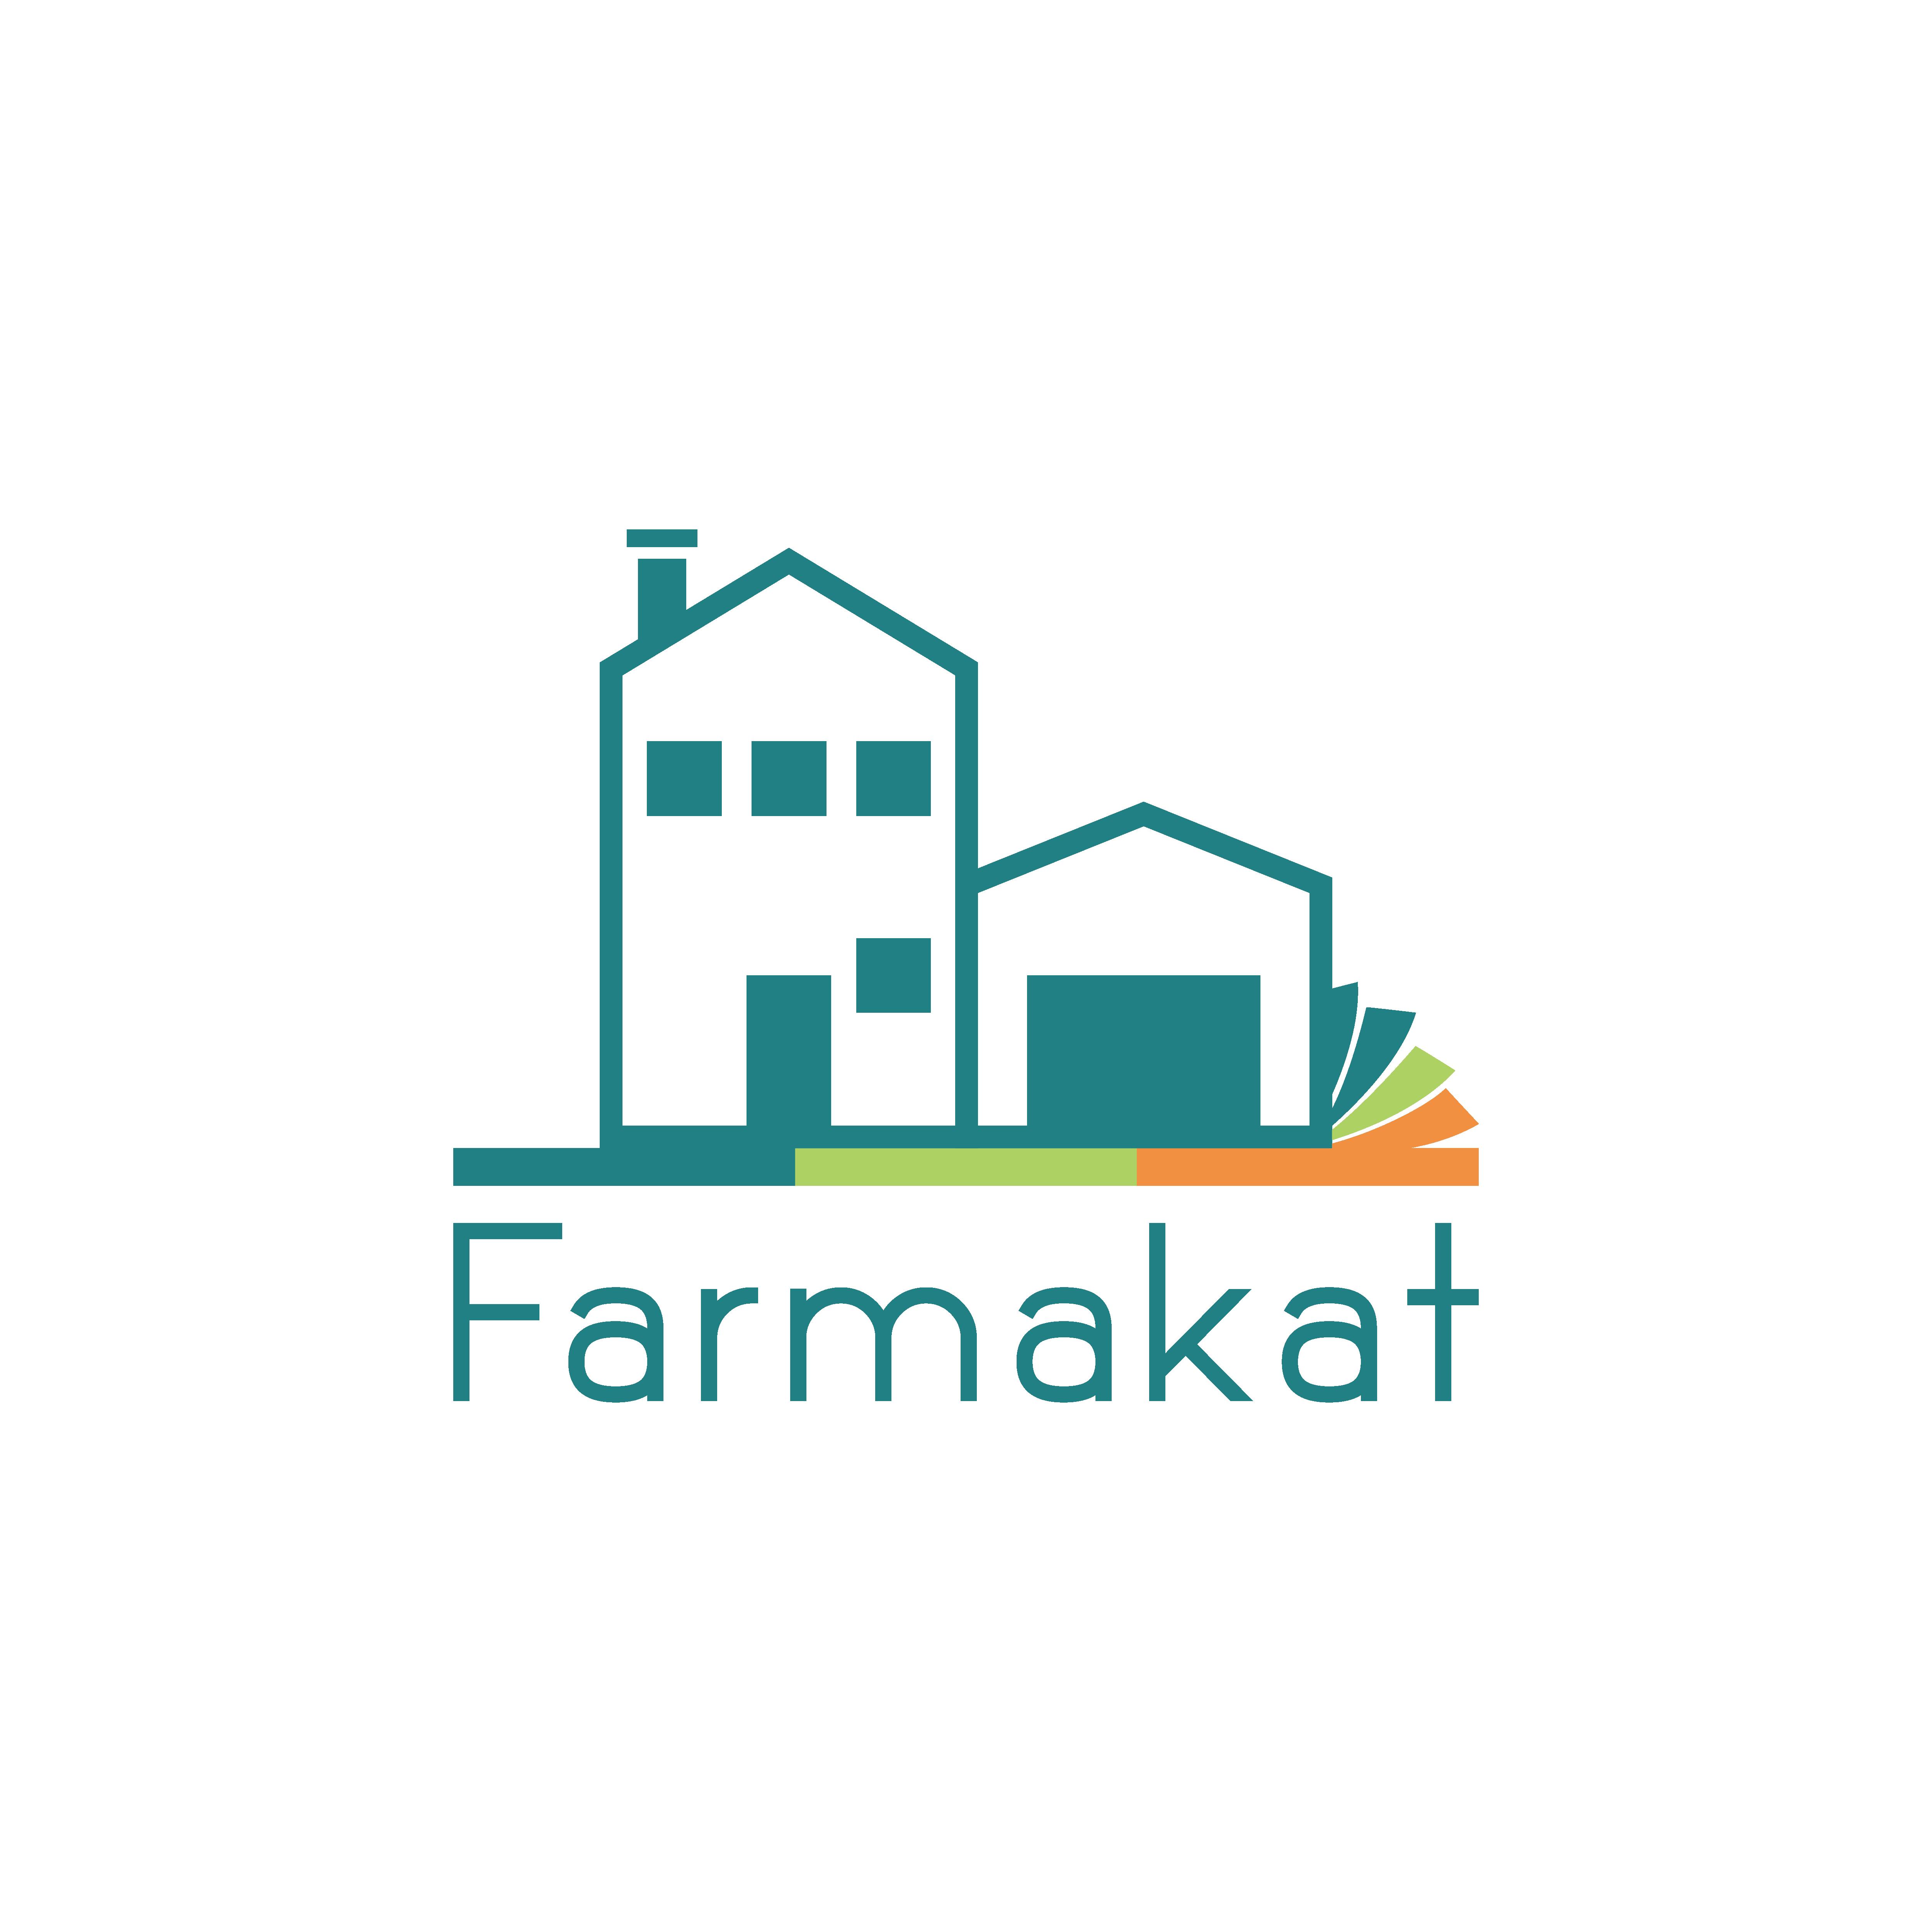 Corporación Farmakat